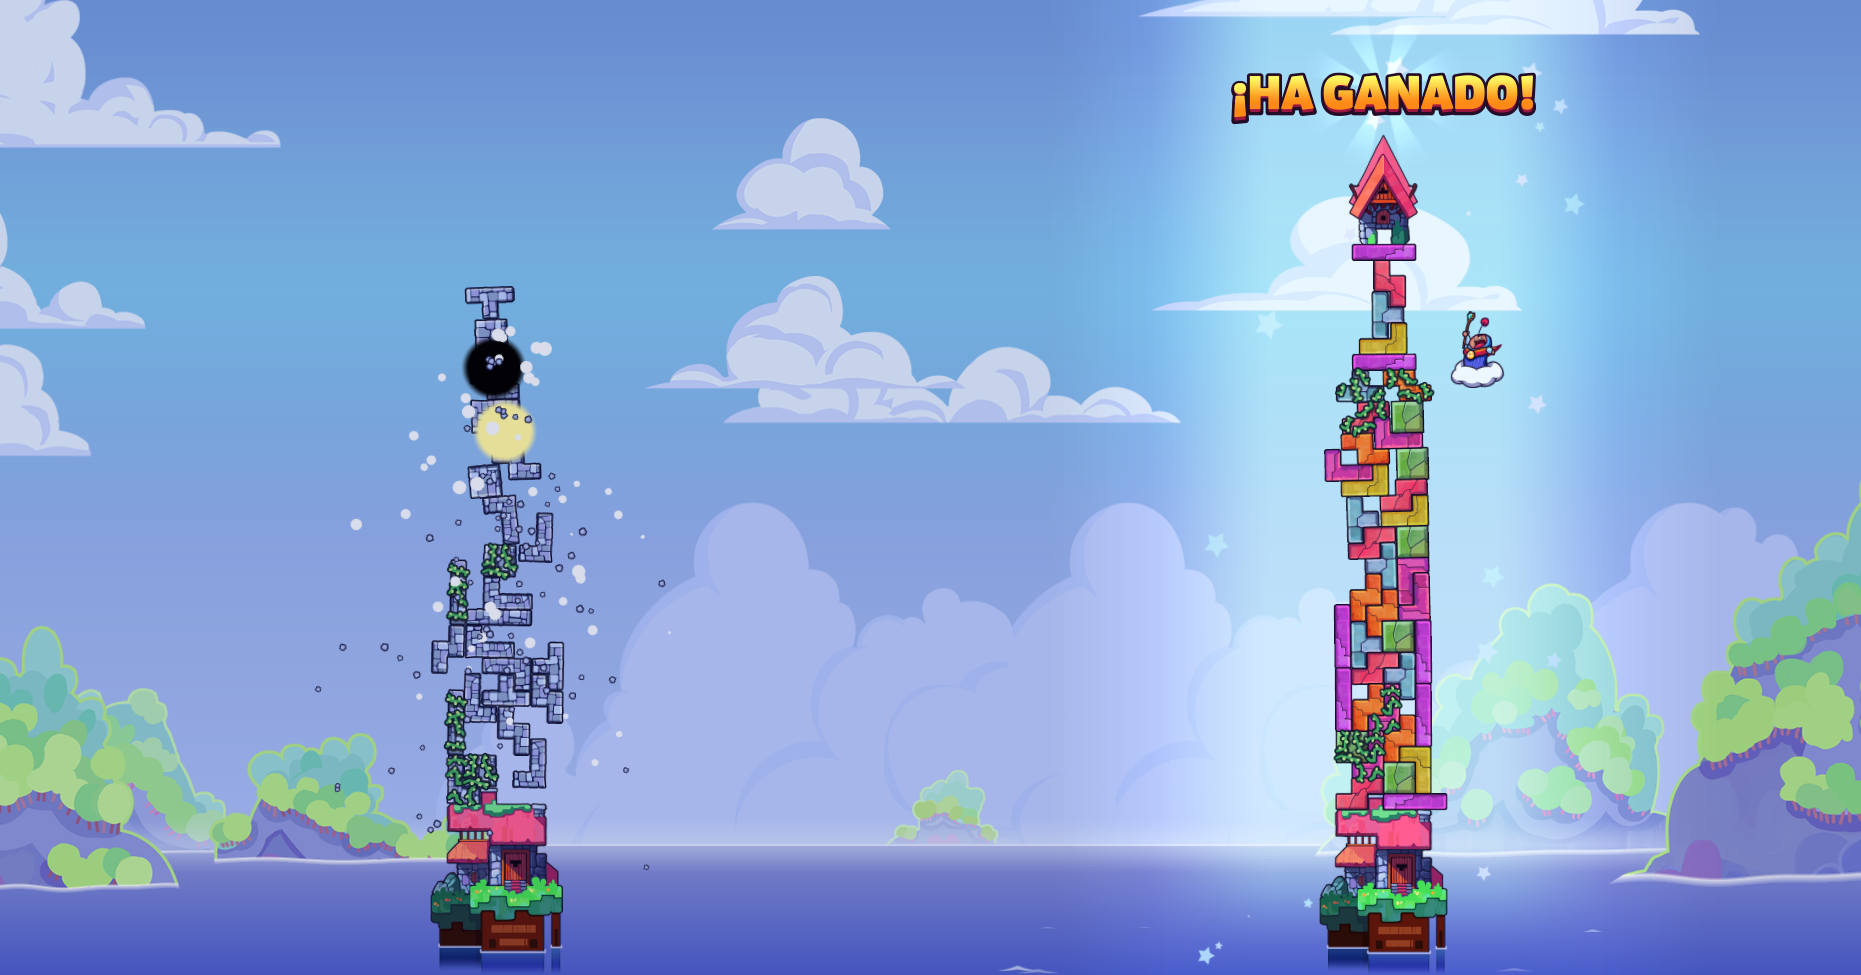 tricky-towers-multijugador-online-partida-ganada